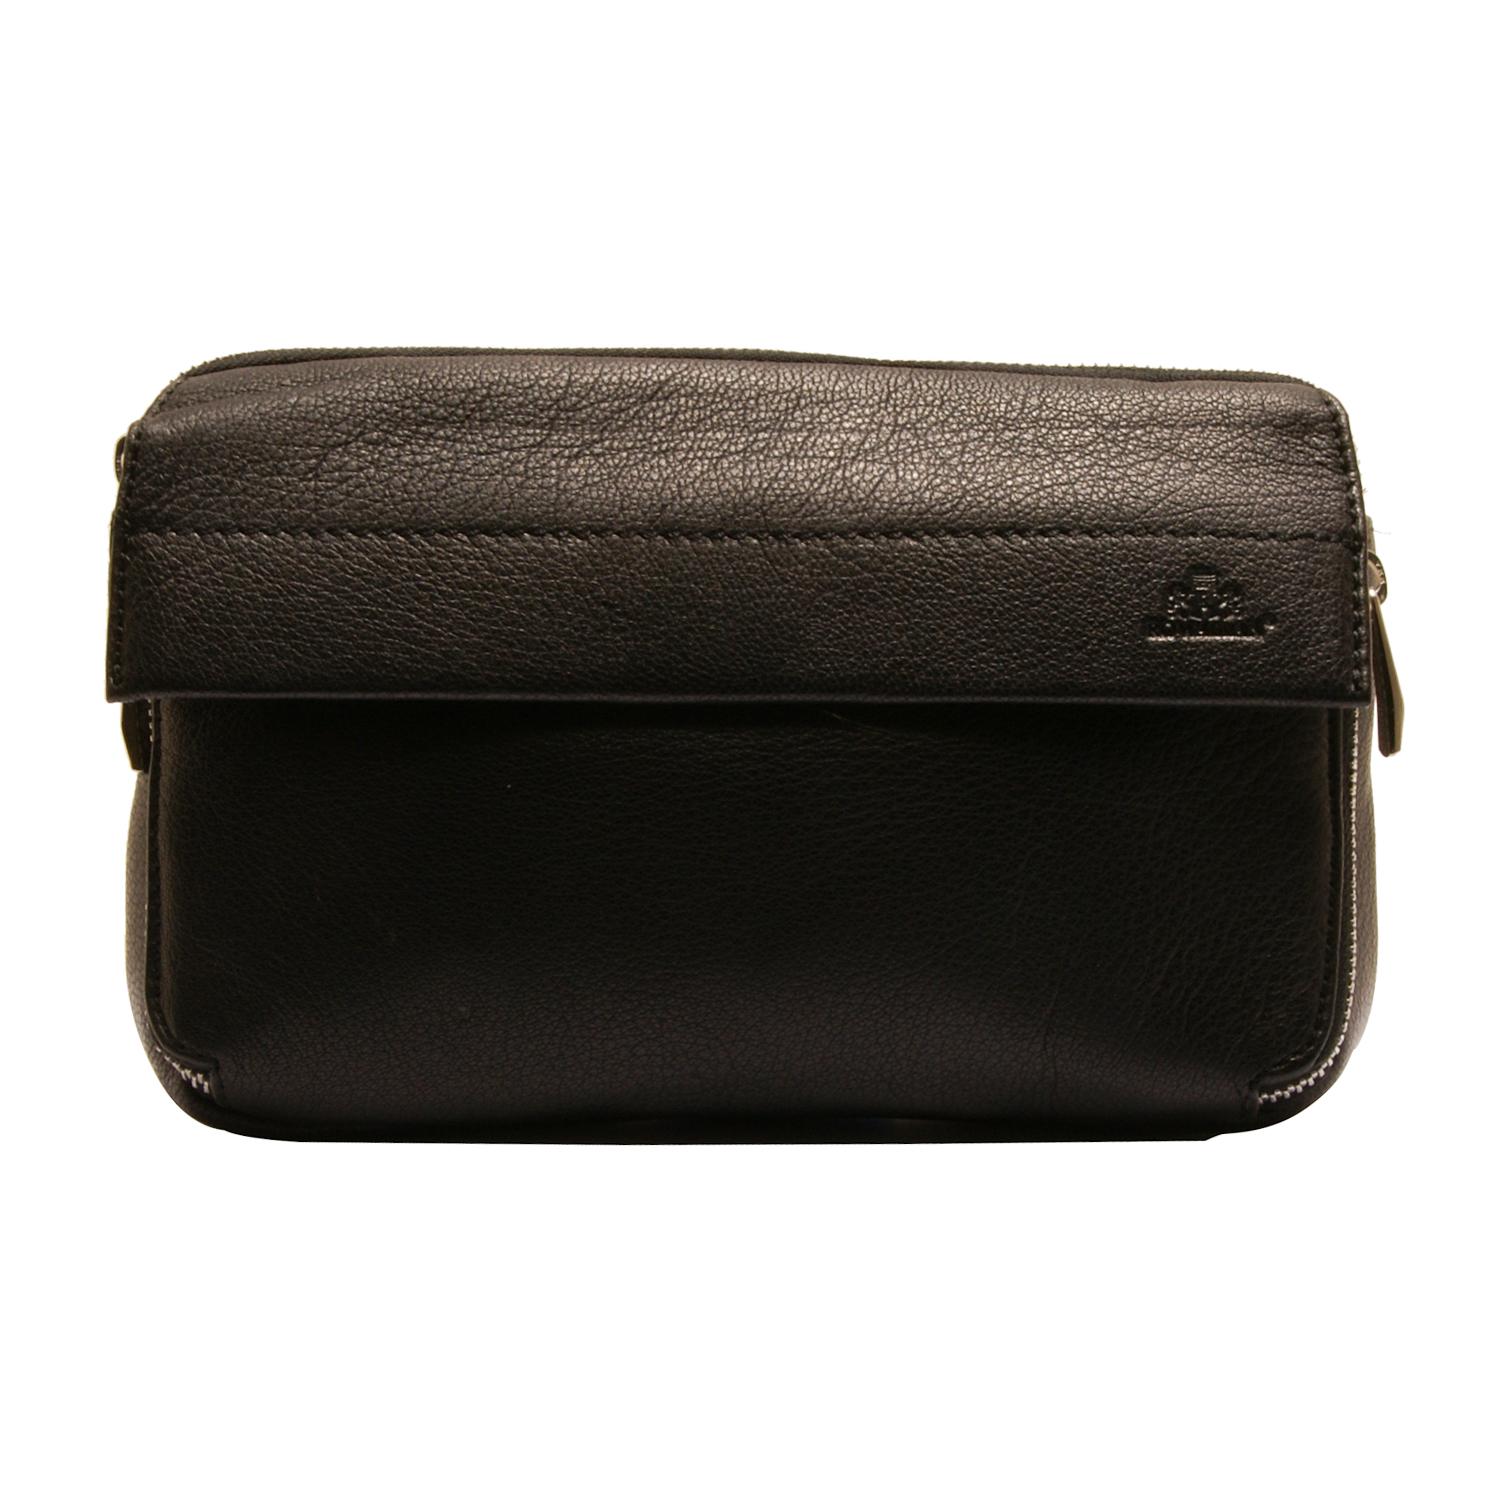 Rowallan – Black Soft Full Grain Italian Style Leather Travel Organiser